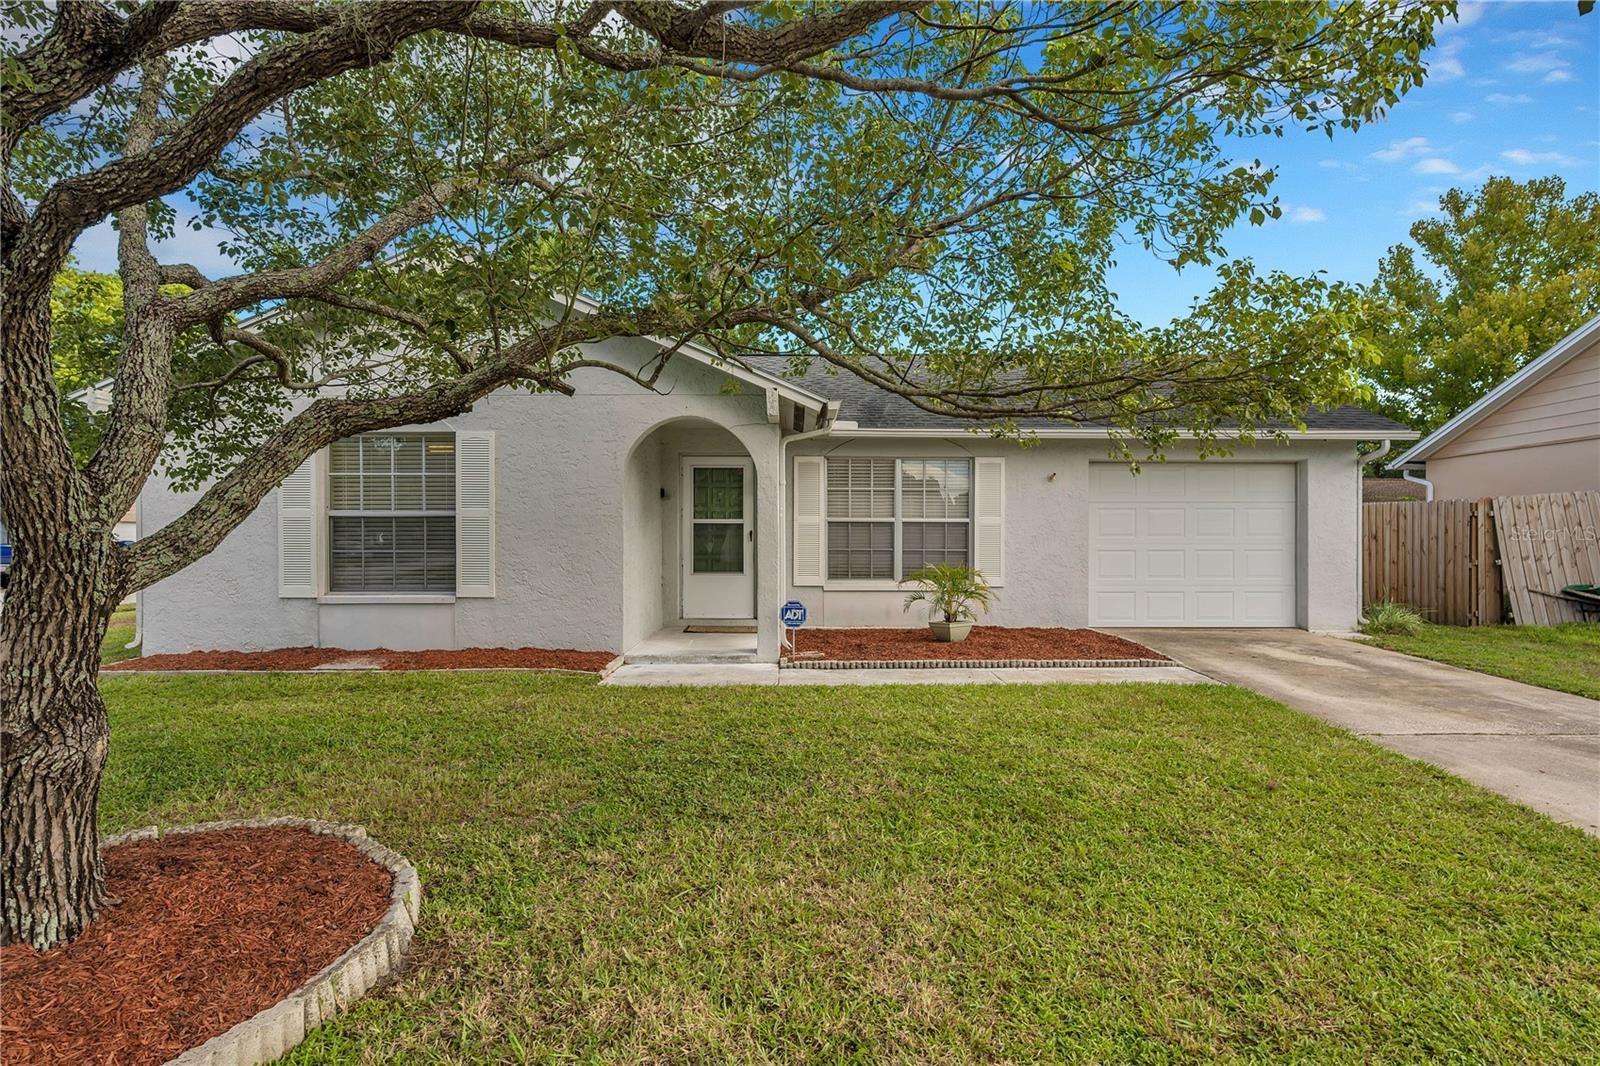 7819 ADEN LOOP, New Port Richey, FL 34655 - MLS#: T3320337